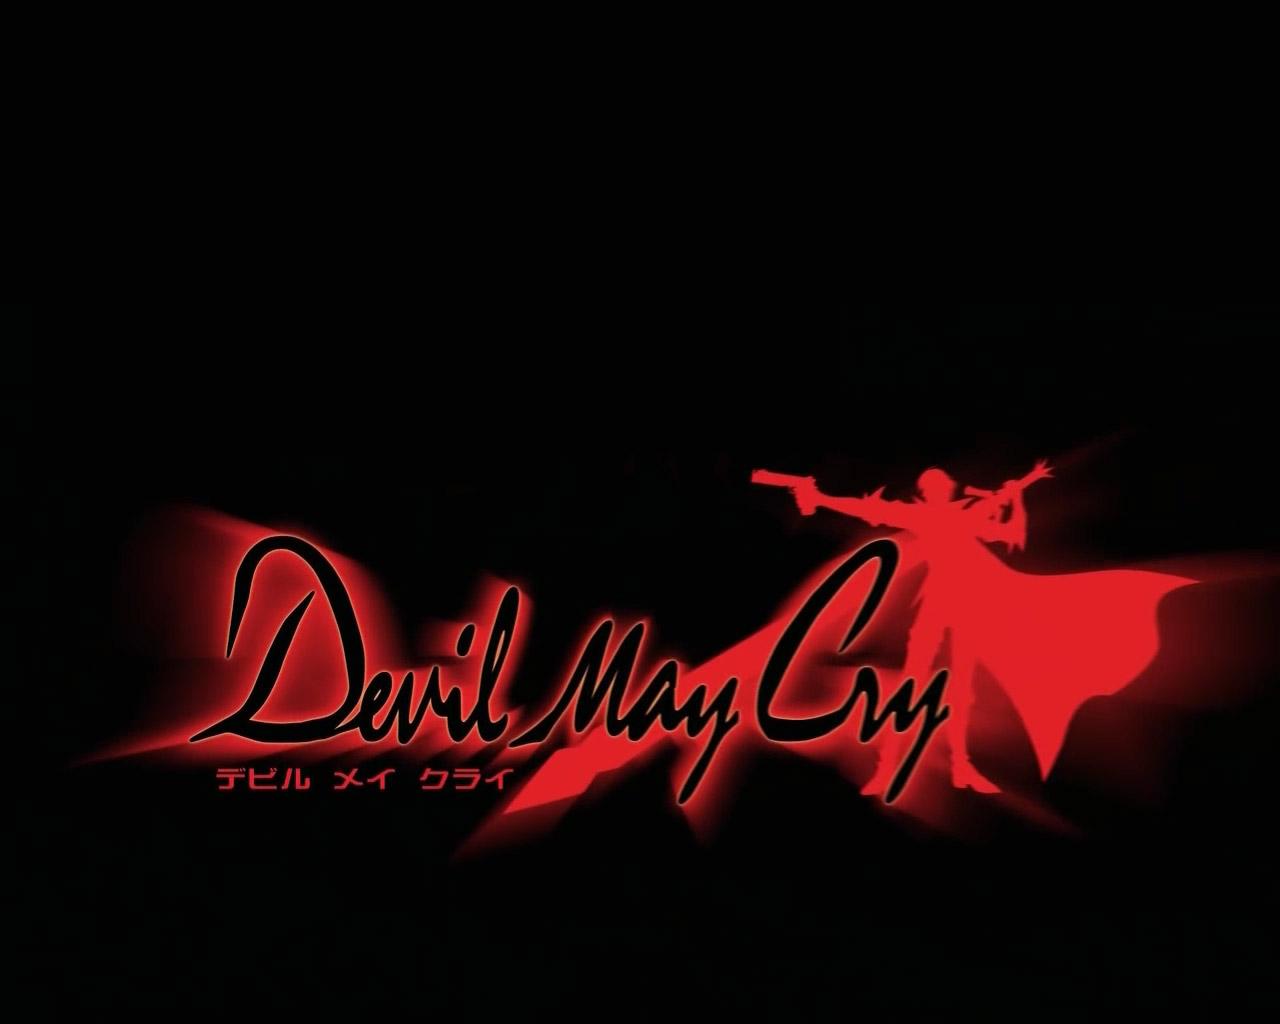 Devil May Cry Wallpaper Rebel Gaming 1280x1024